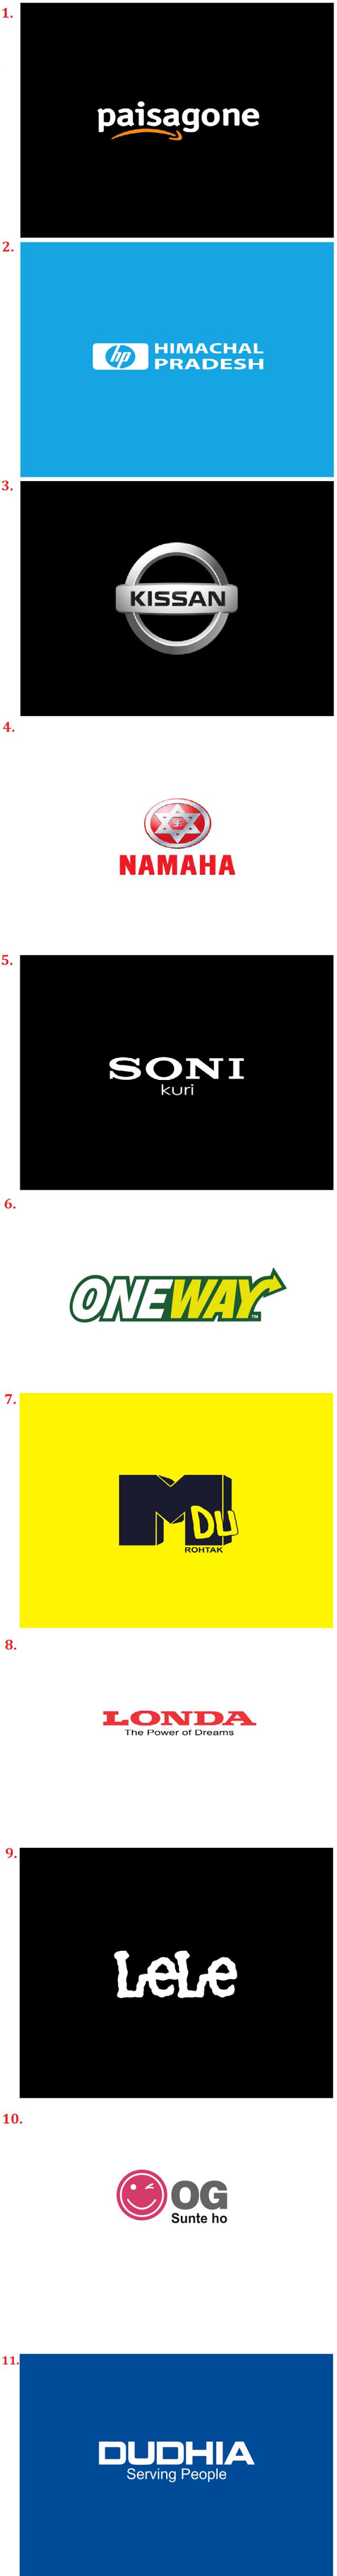 Desi-Versions-of-Famous-Brand-Logos+1Amazon-PaisaGone+2HP-Himachal-Pradesh+3Nissan-Kissan+4Yamaha-Namaha+5Sony-Soni+6SubWay-OneWay+7MTv-MDu+8HONDA-LONDA+9Lee-LeLe+10LG-OG-Sunte-Ho+11Nokia-Dudhia-Serving-People